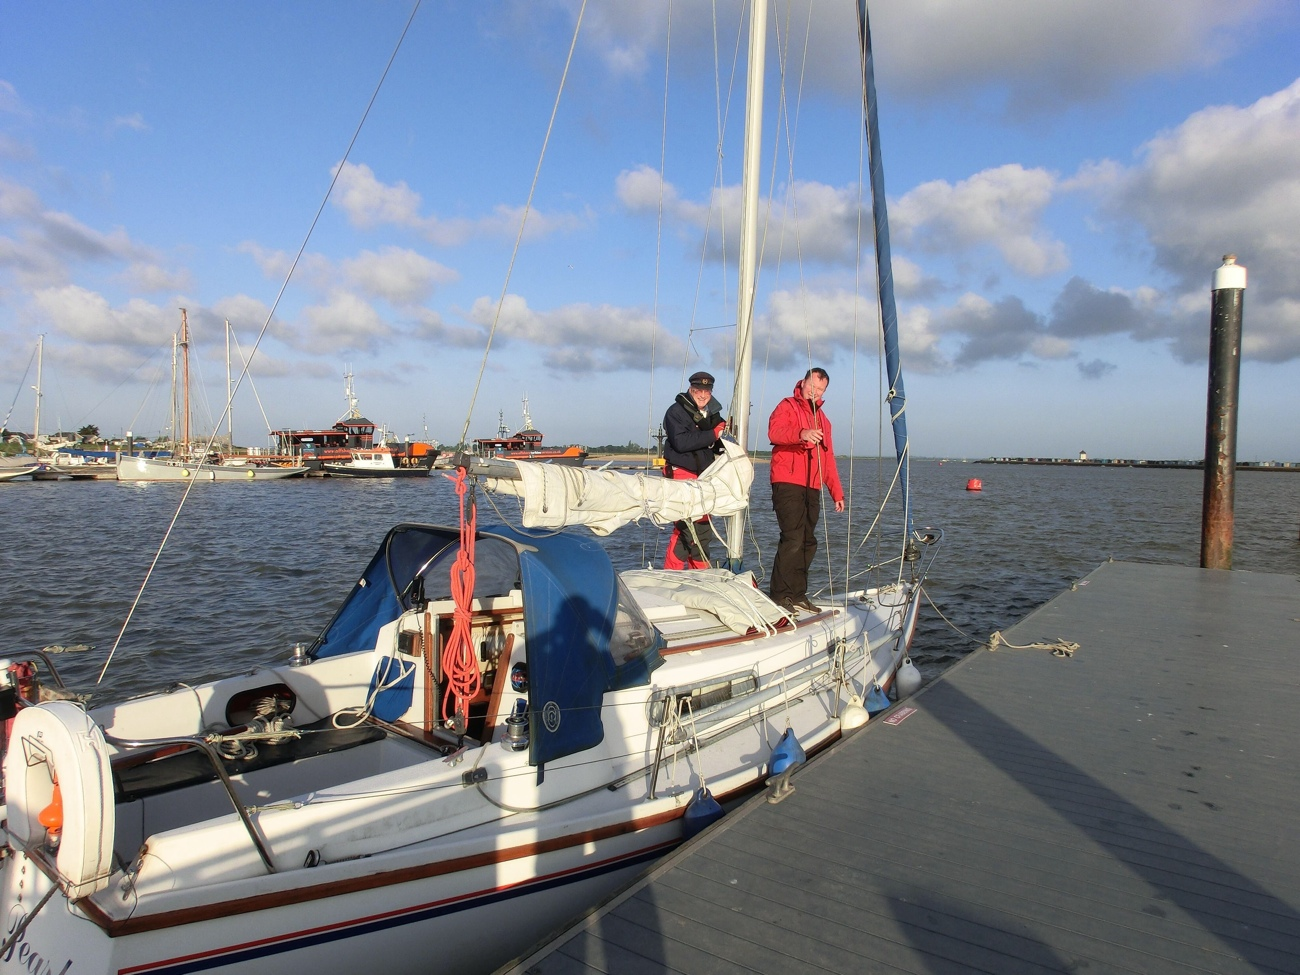 Silver Pearl leaves Brightlingsea Little Ship Club Sadler 26